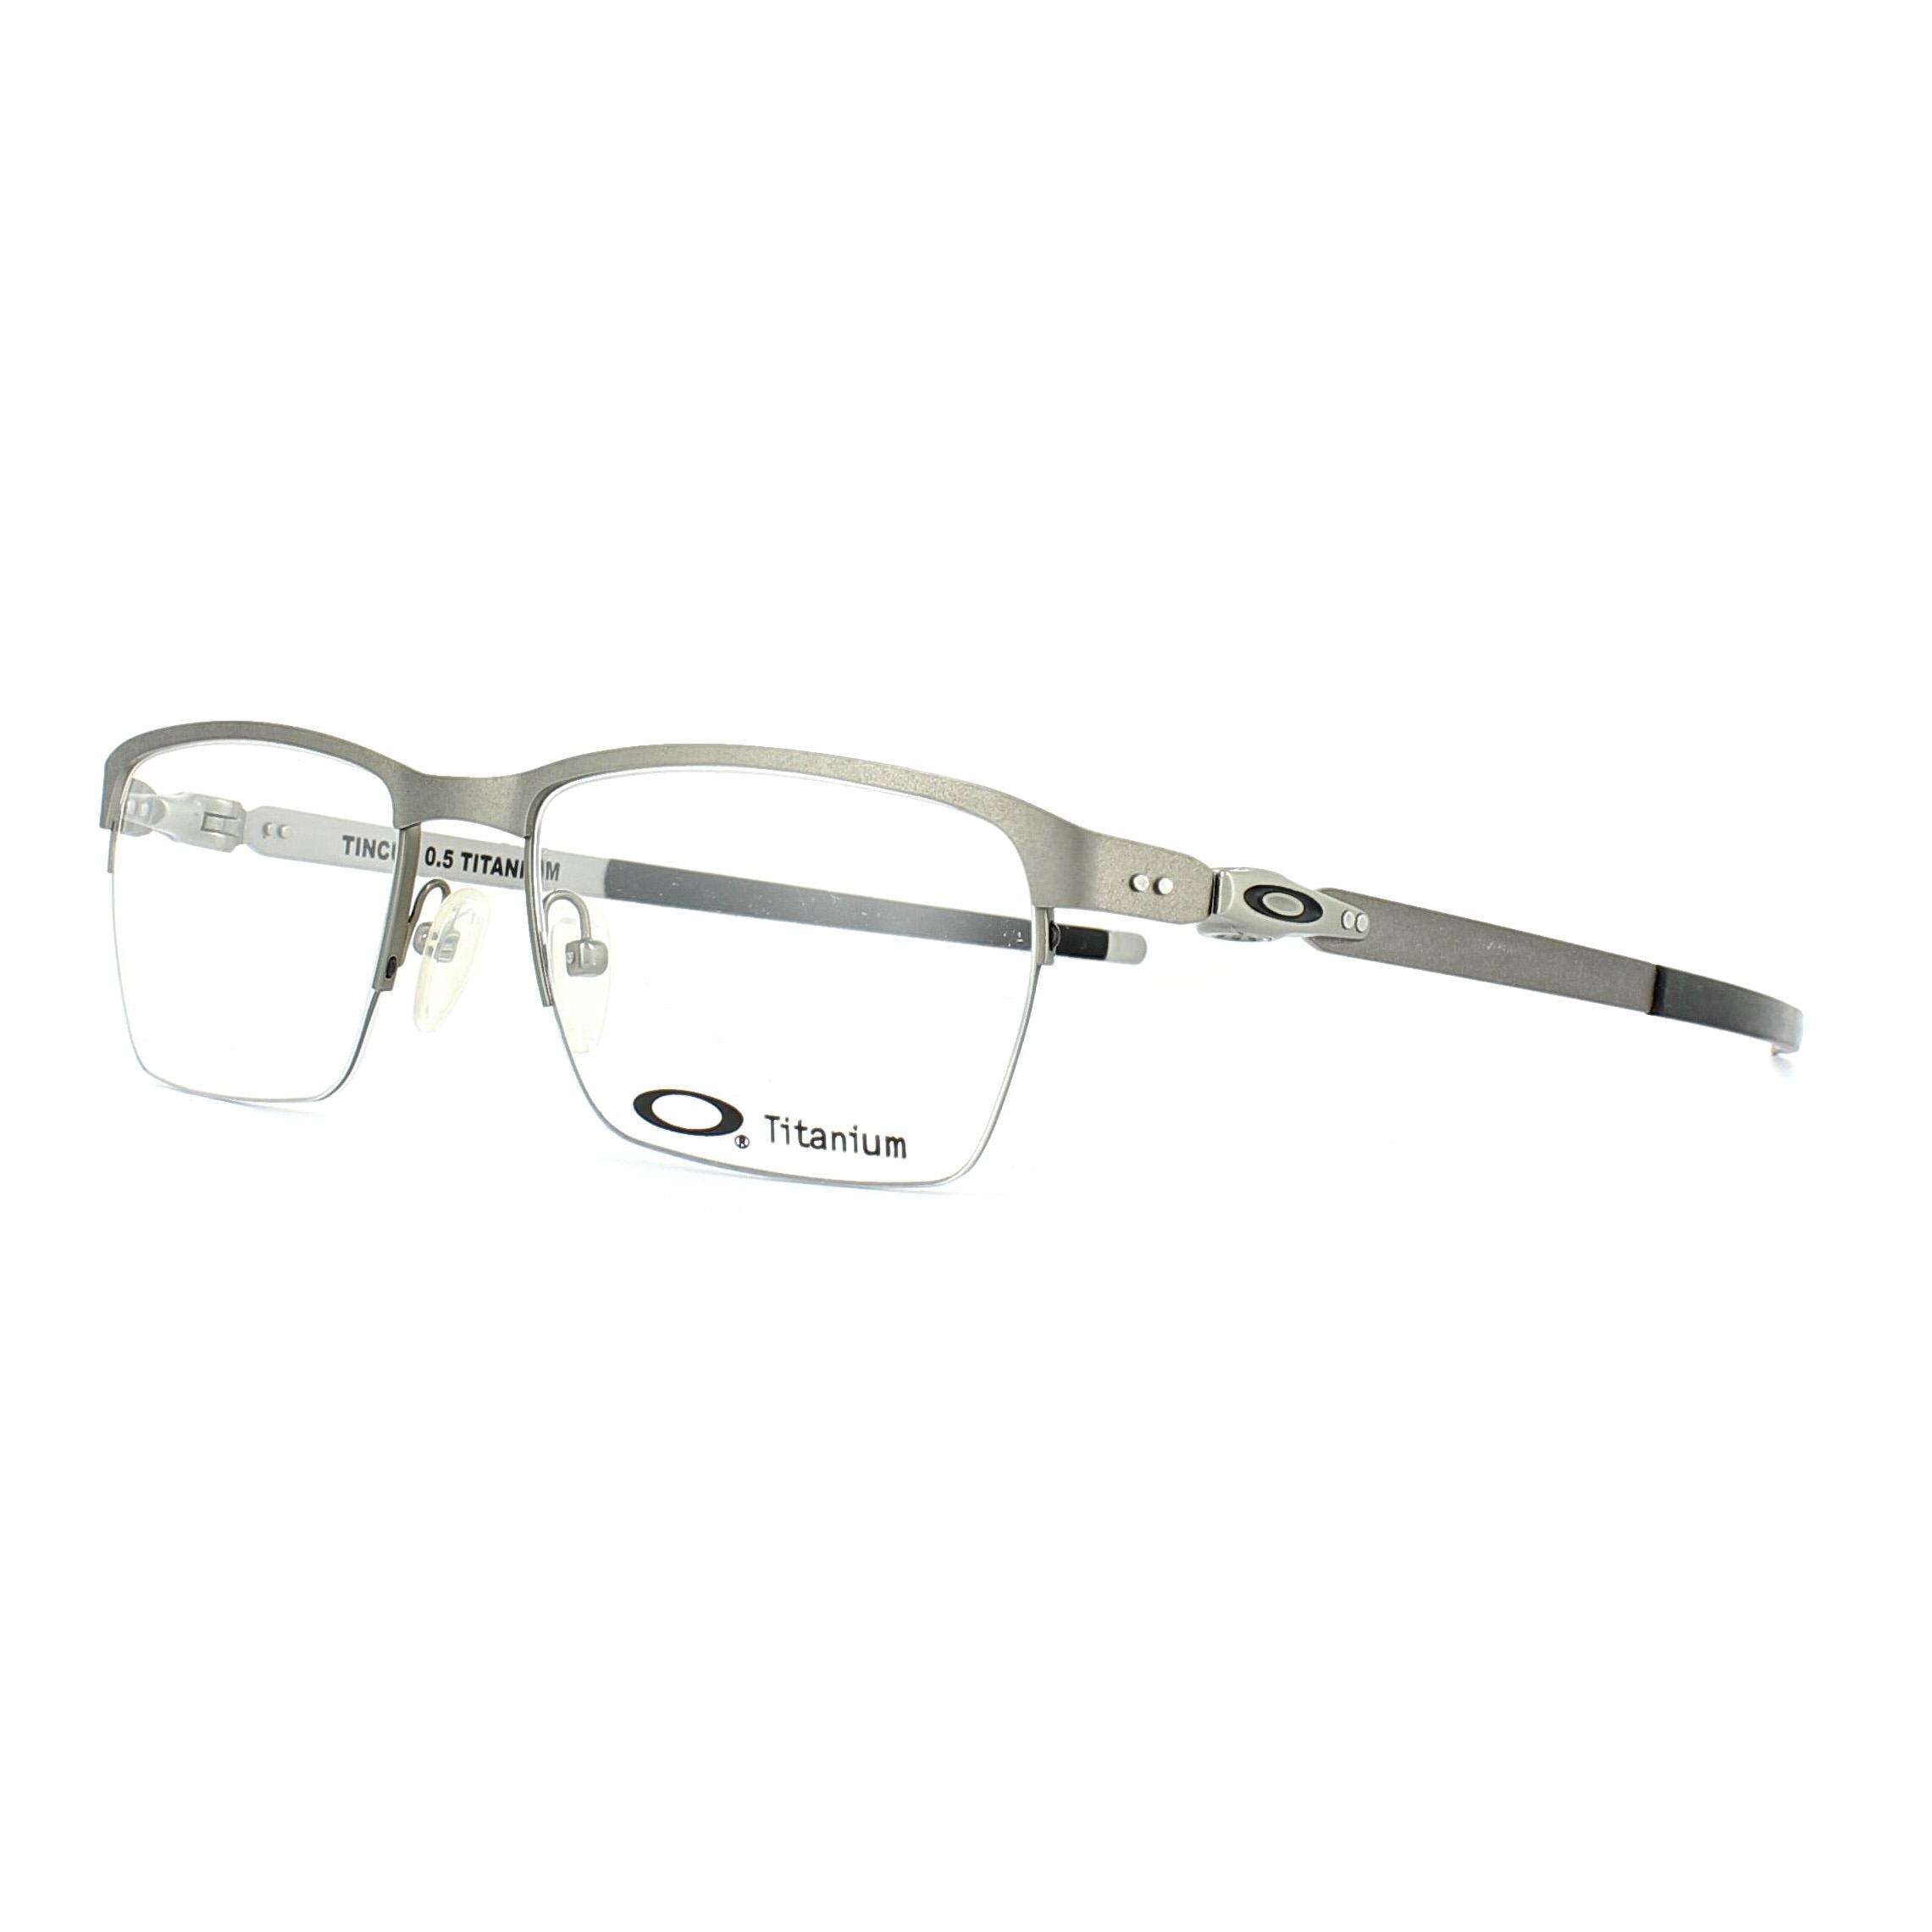 6c60e05c5c383 Sentinel Oakley Glasses Frames Tincup 0.5 OX5099-02 Powder Steel 51mm Mens